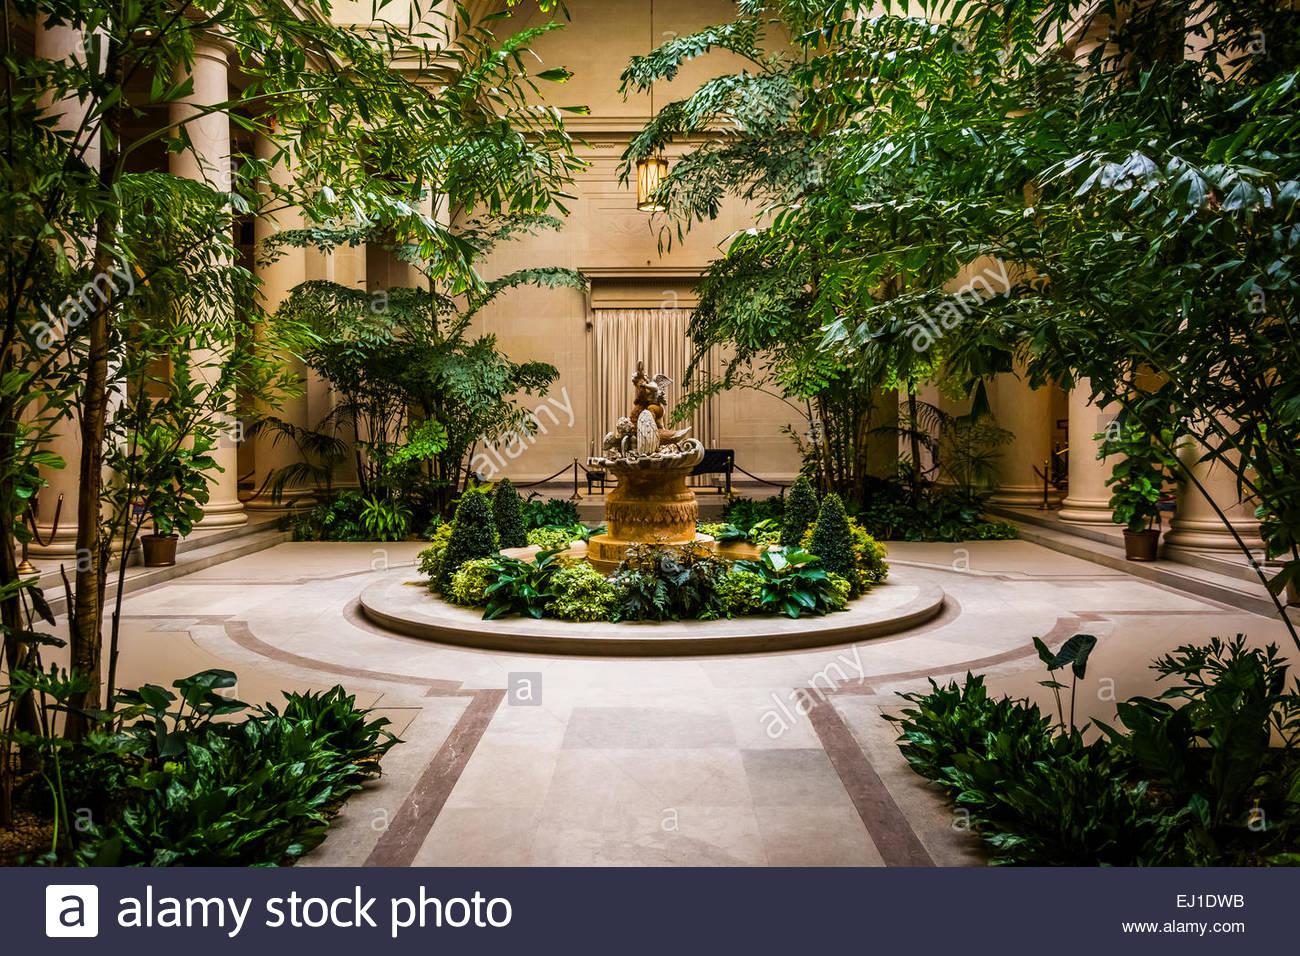 Indoor garden area in the National Gallery of Art in Washington, DC. - Stock Image